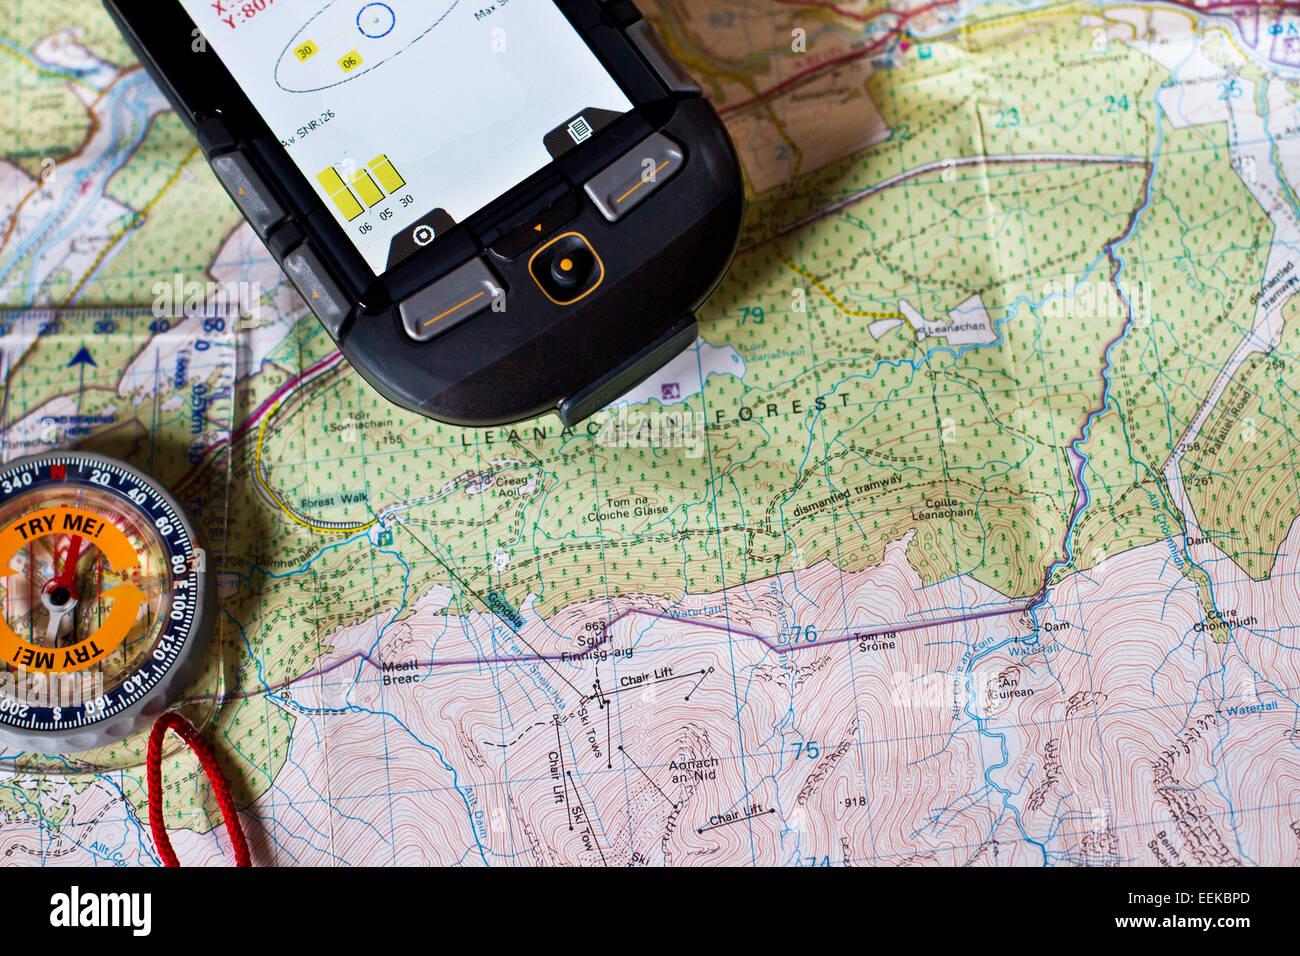 Paper map,compass and modern GPS unit. Navigation, outdoor explorer concept. Outdoor Navigation - Stock Image